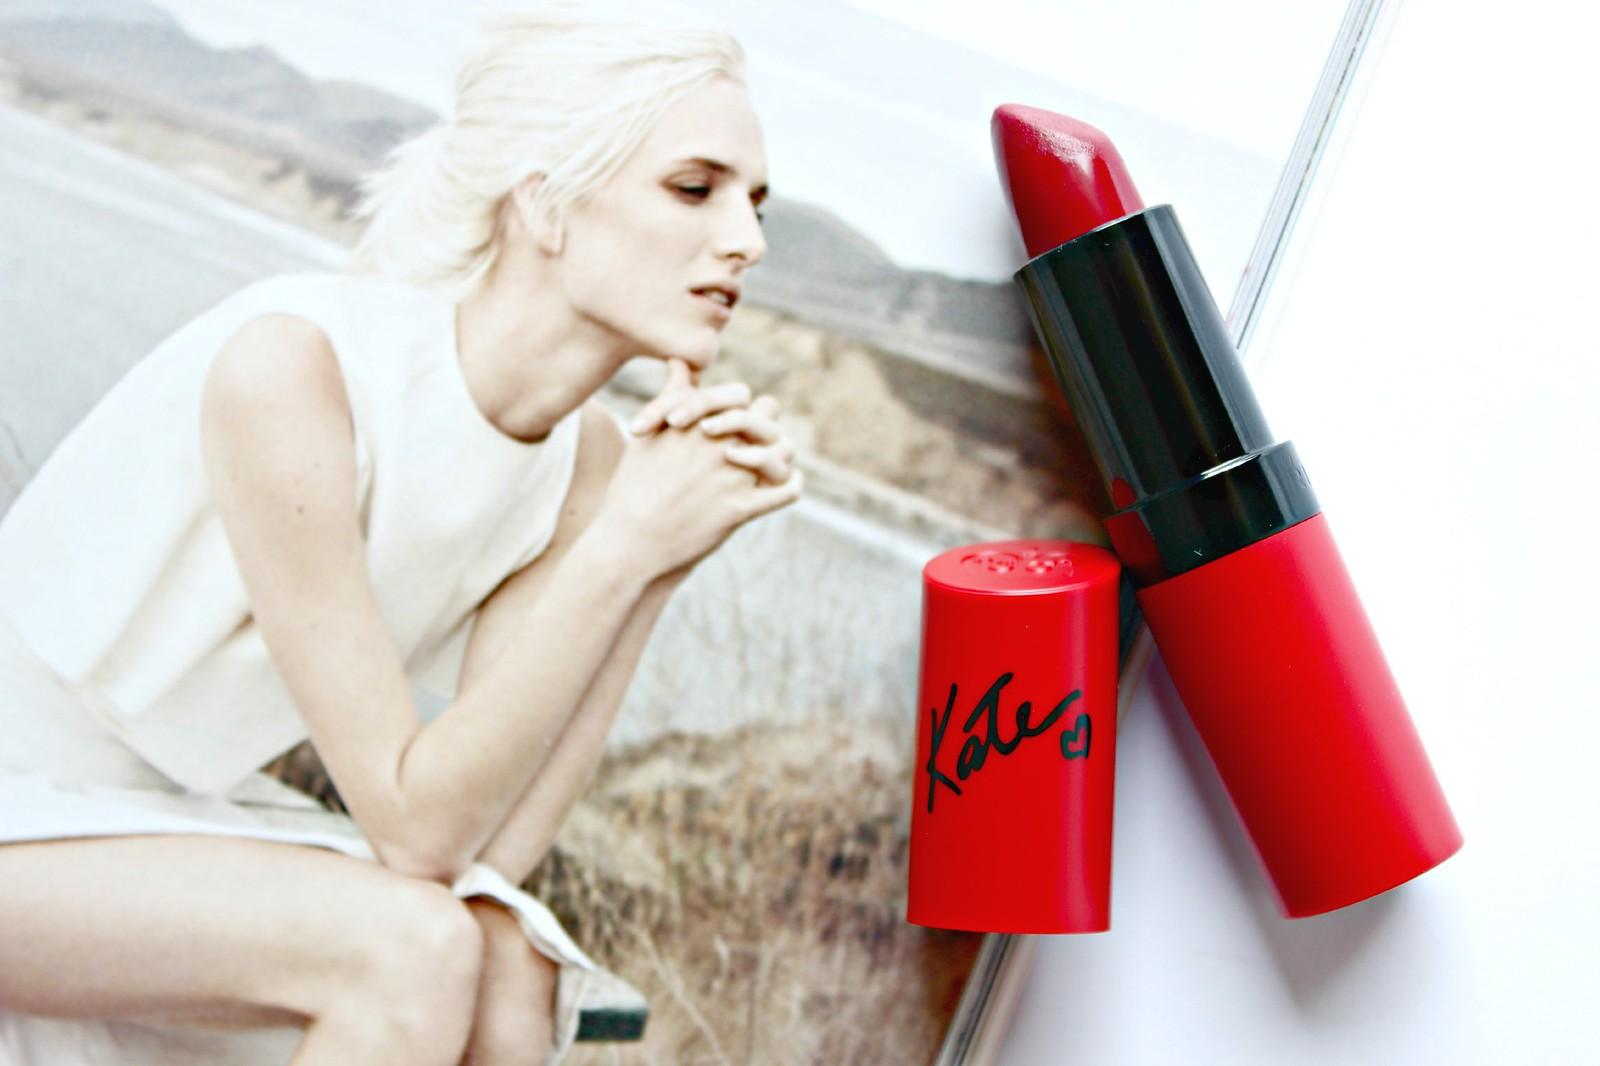 Rimmel 107 Lipstick